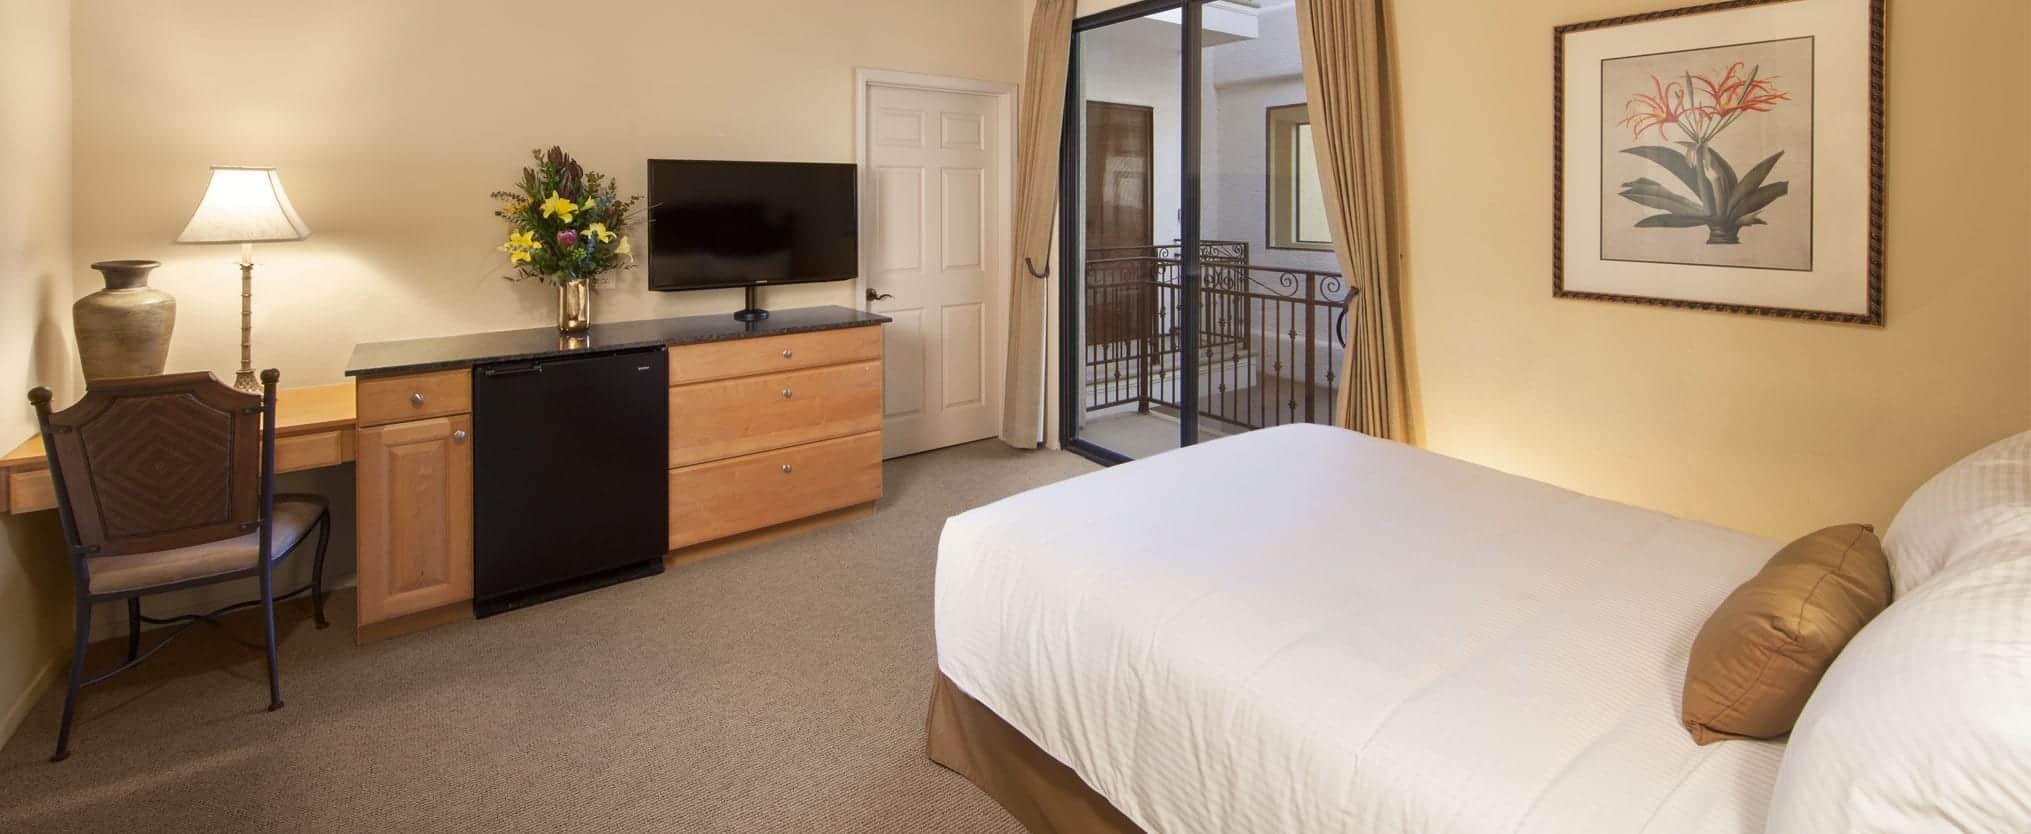 STANDARD GUEST ROOM WITH 1 QUEEN BED